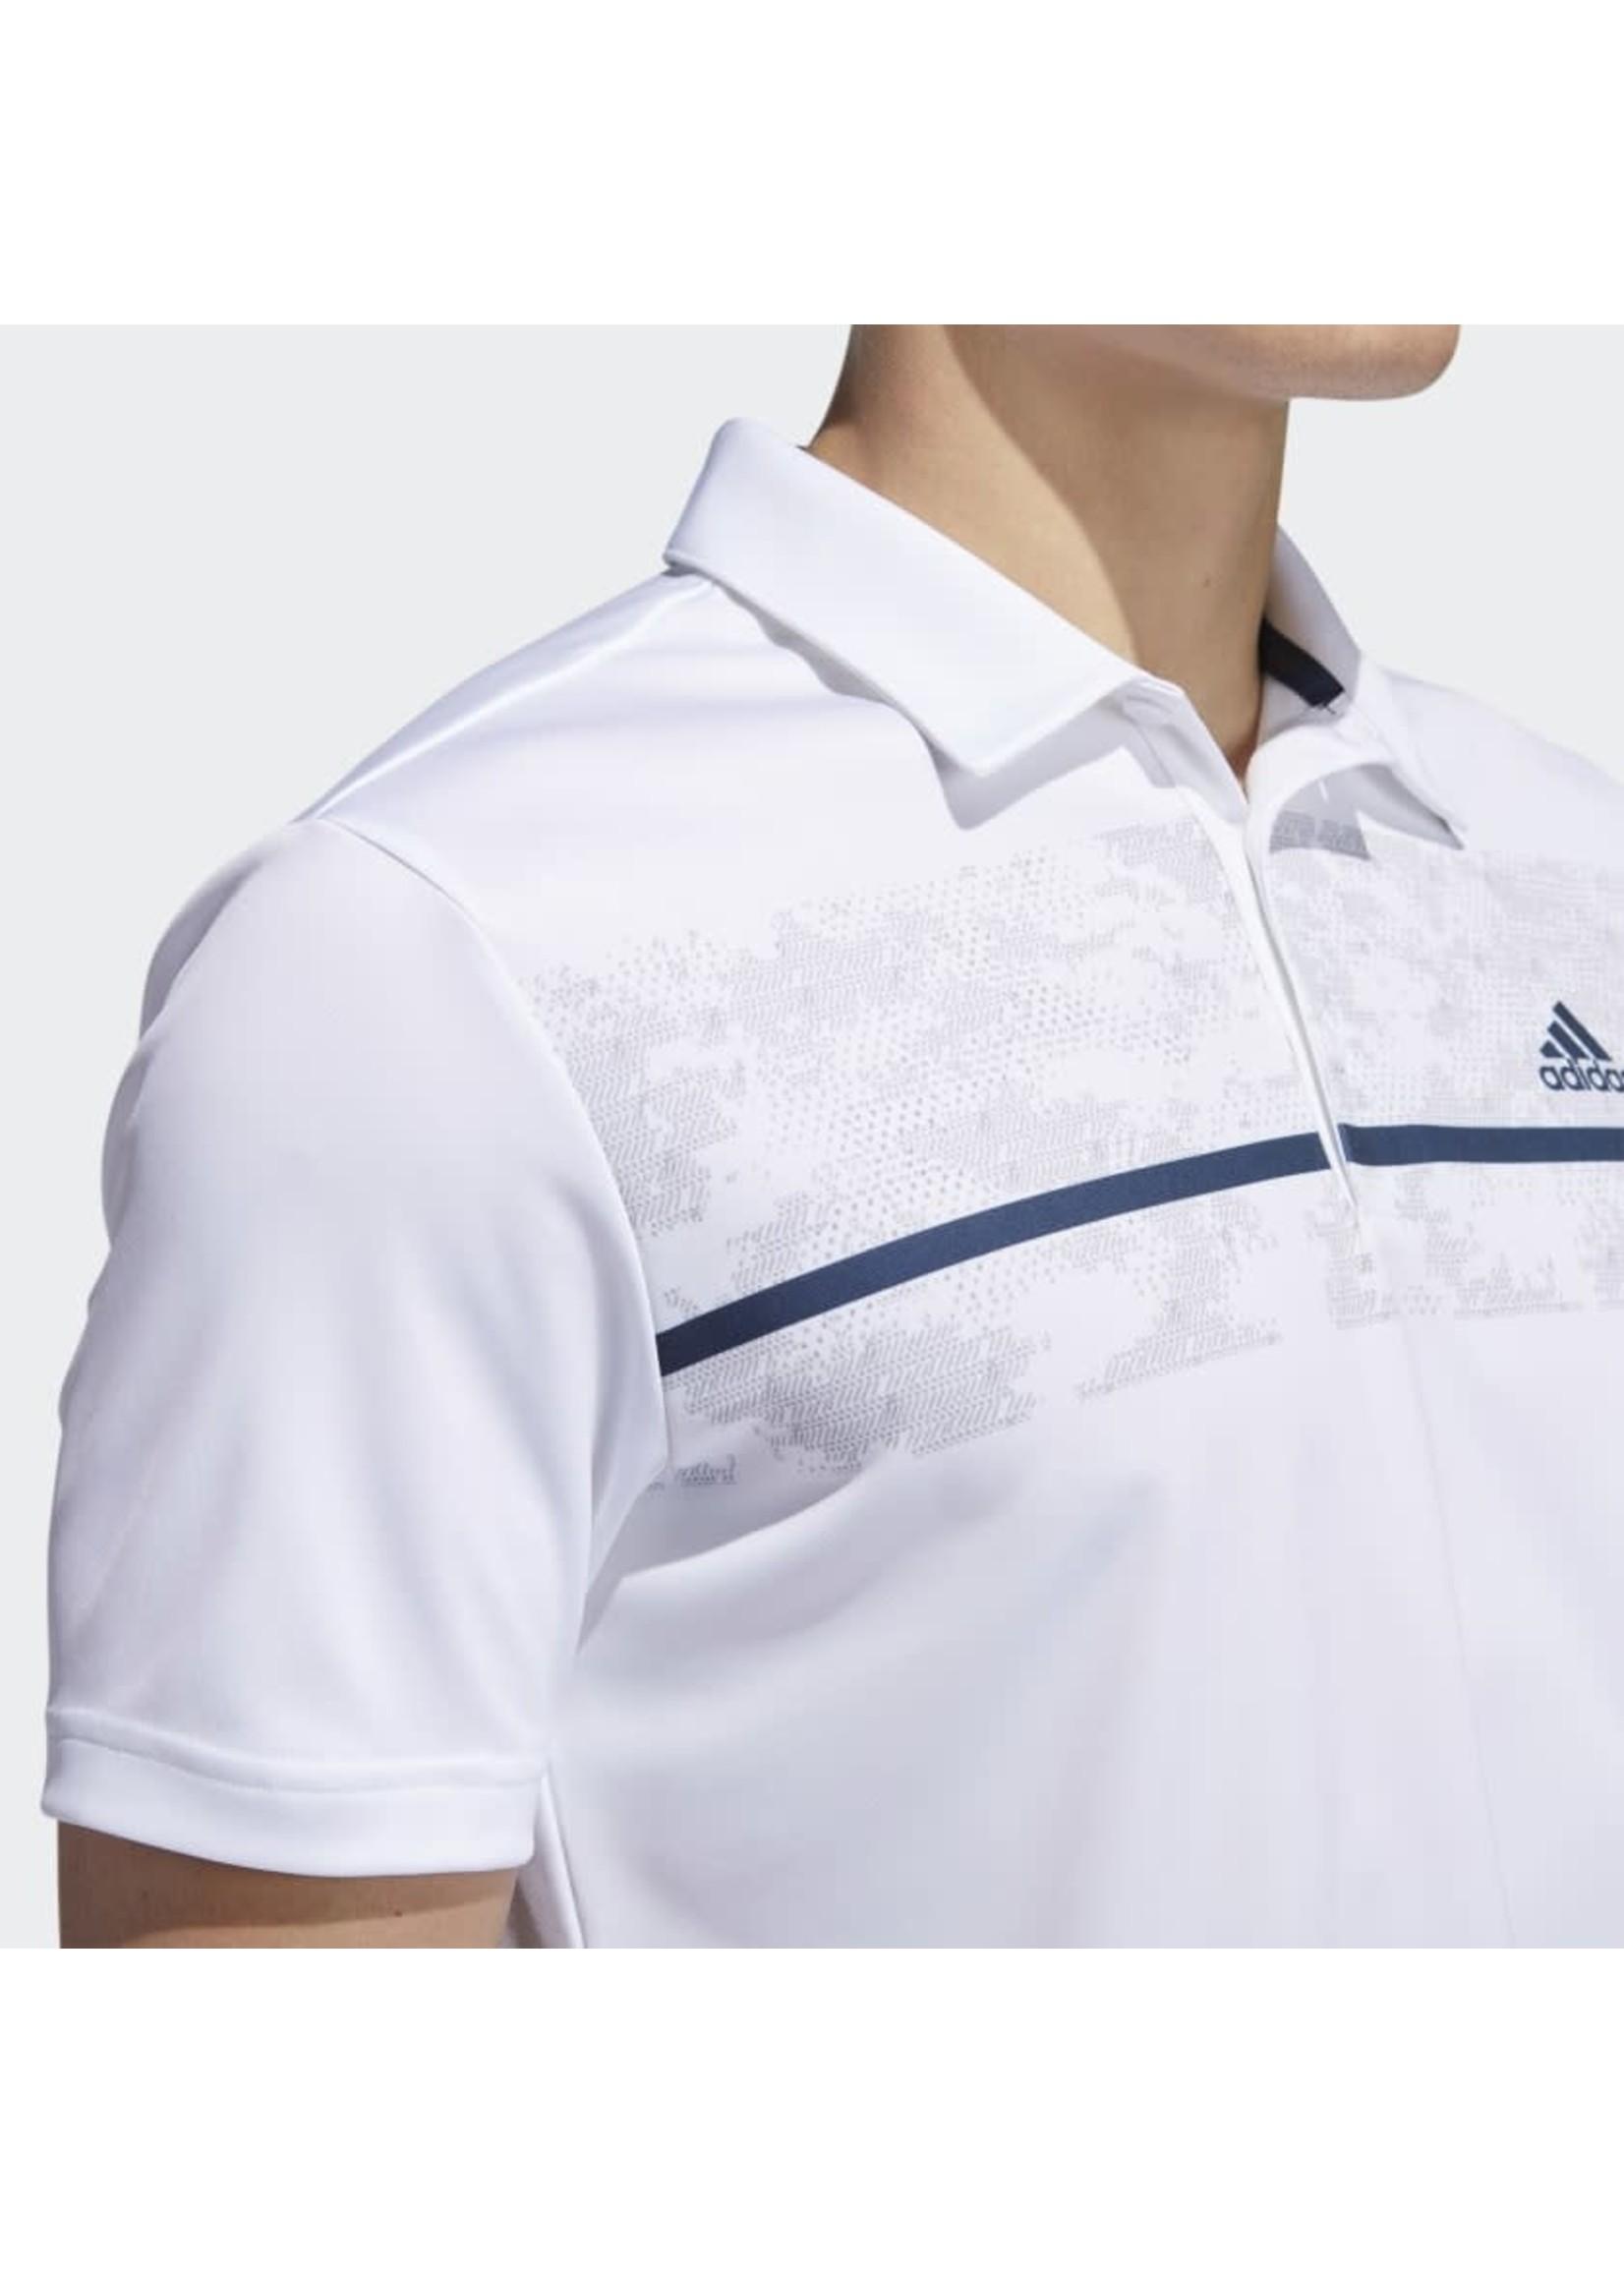 Adidas Adidas Chest Print Prime Green Mens Polo Shirt (2021)